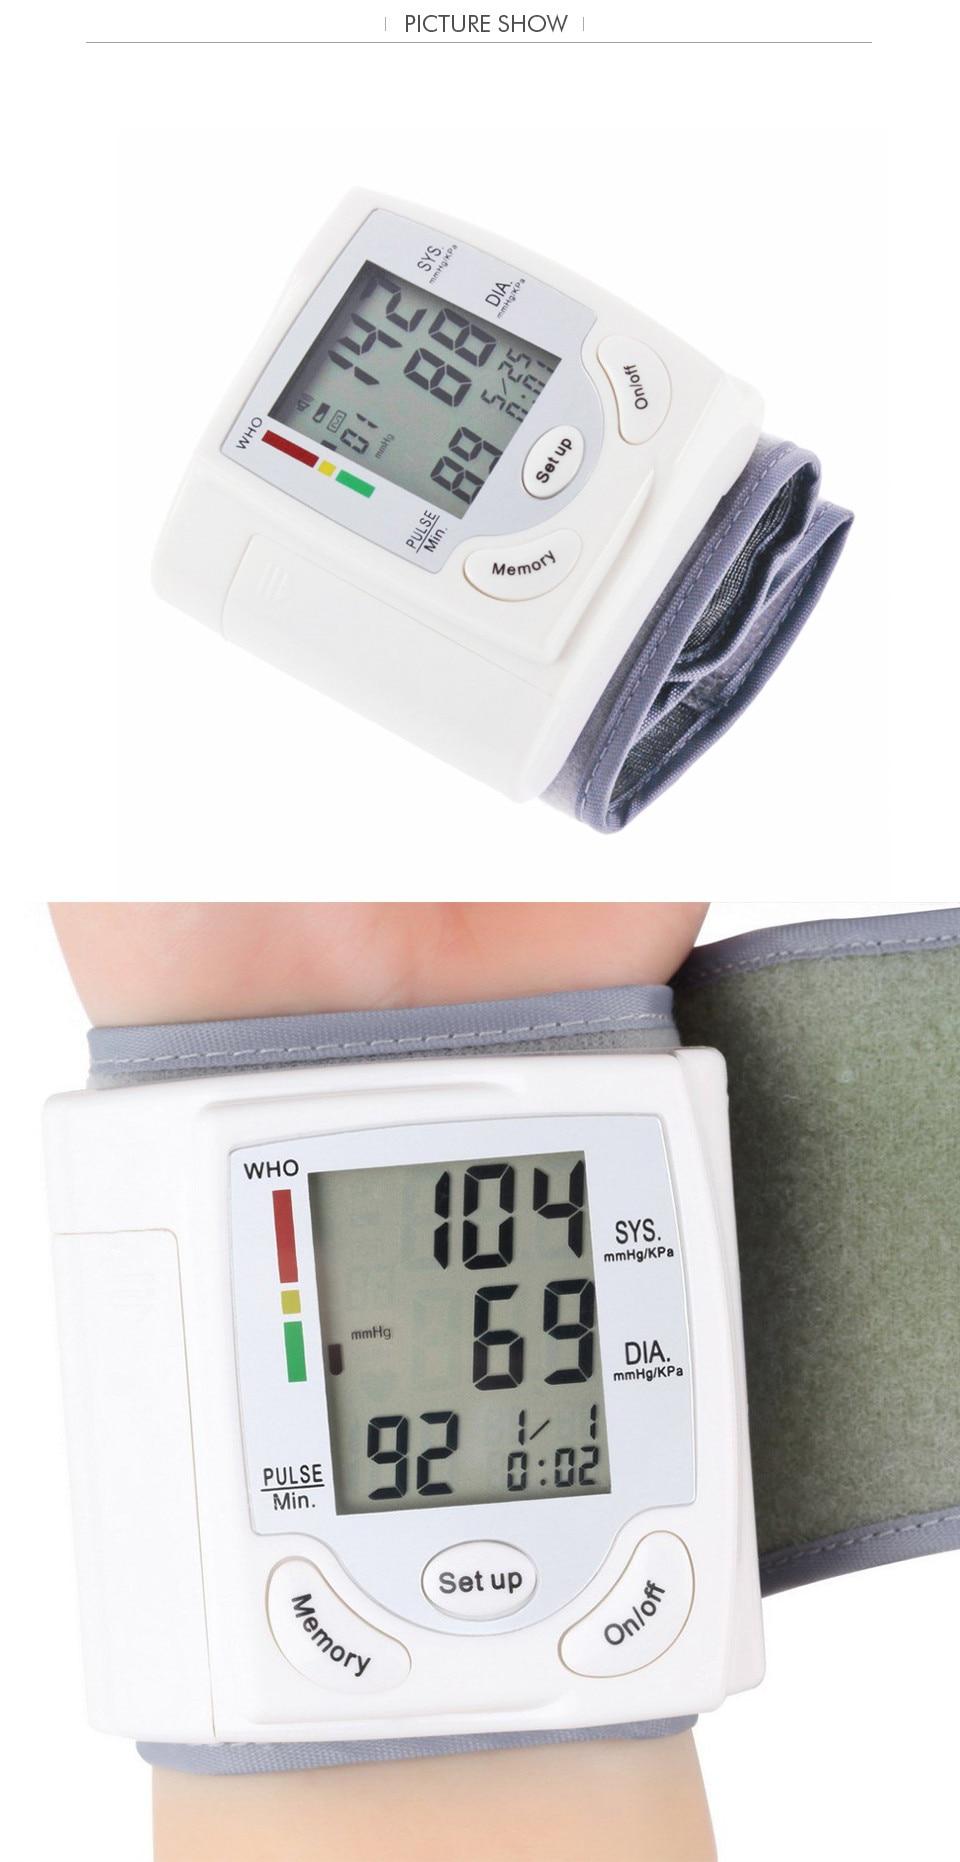 Gustala Automatic Digital Sphygmomanometer Wrist Cuff Arm Blood Pressure Monitor Meter Gauge Measure Portable Bracelet Device 18